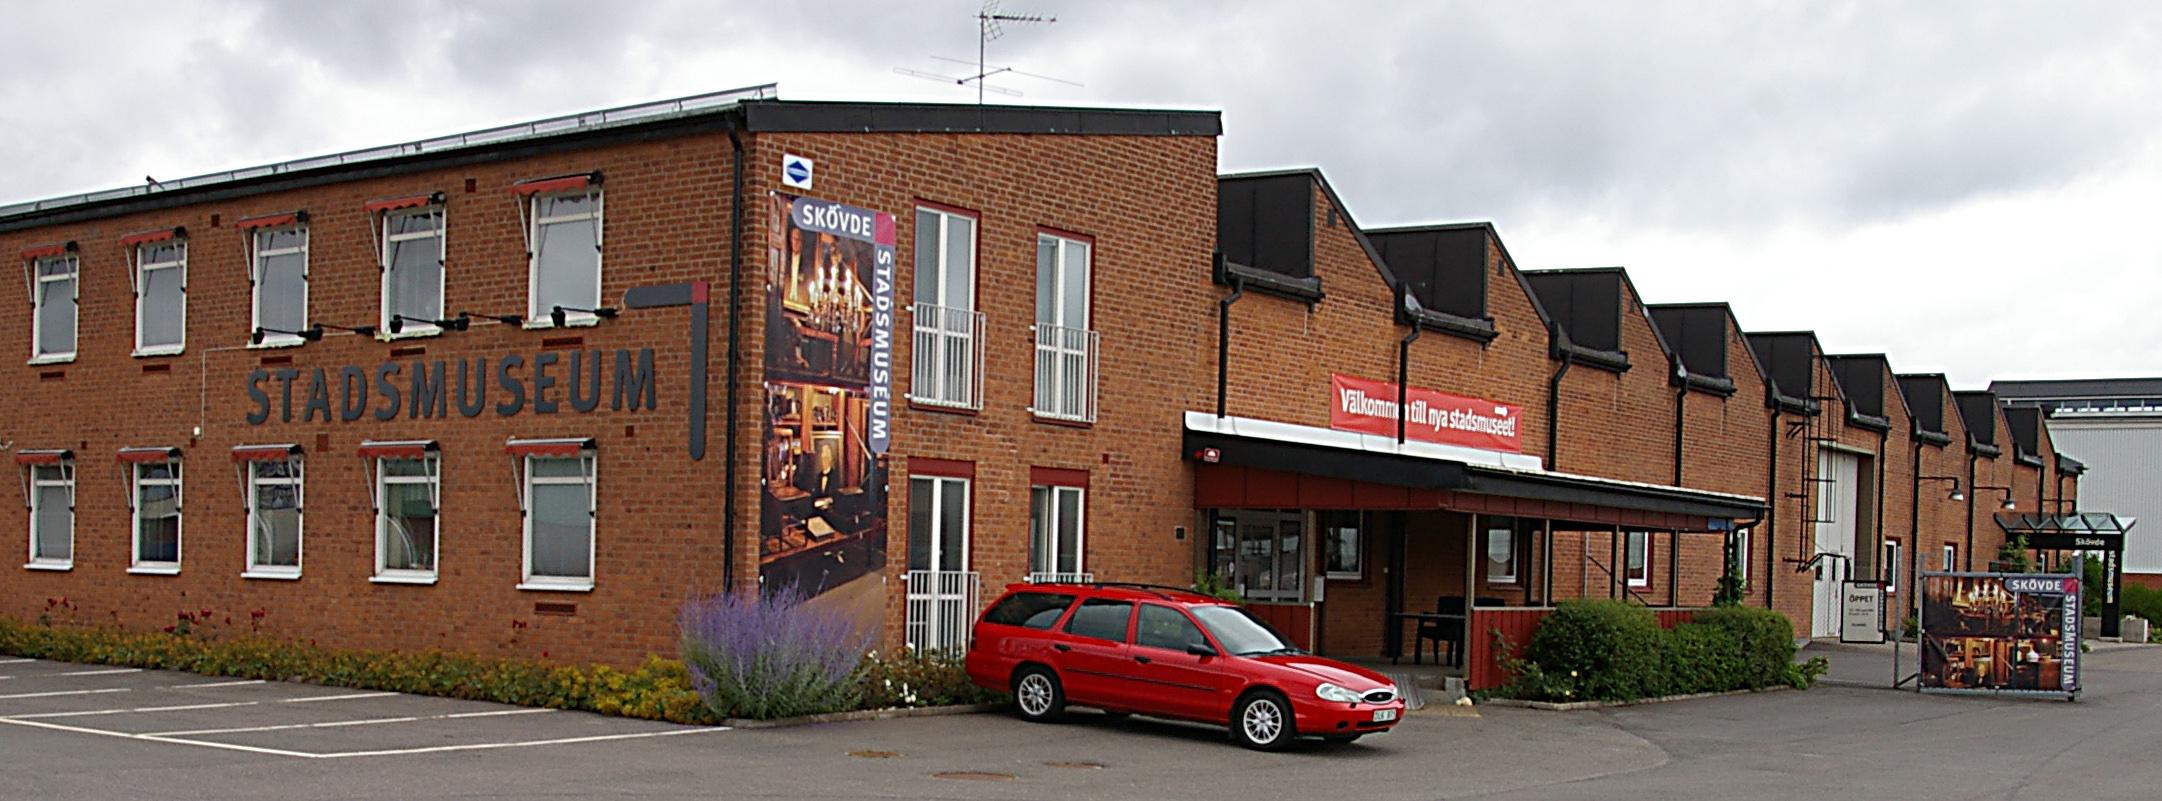 Skvde swedish dating site eskort i bors nra gteborg